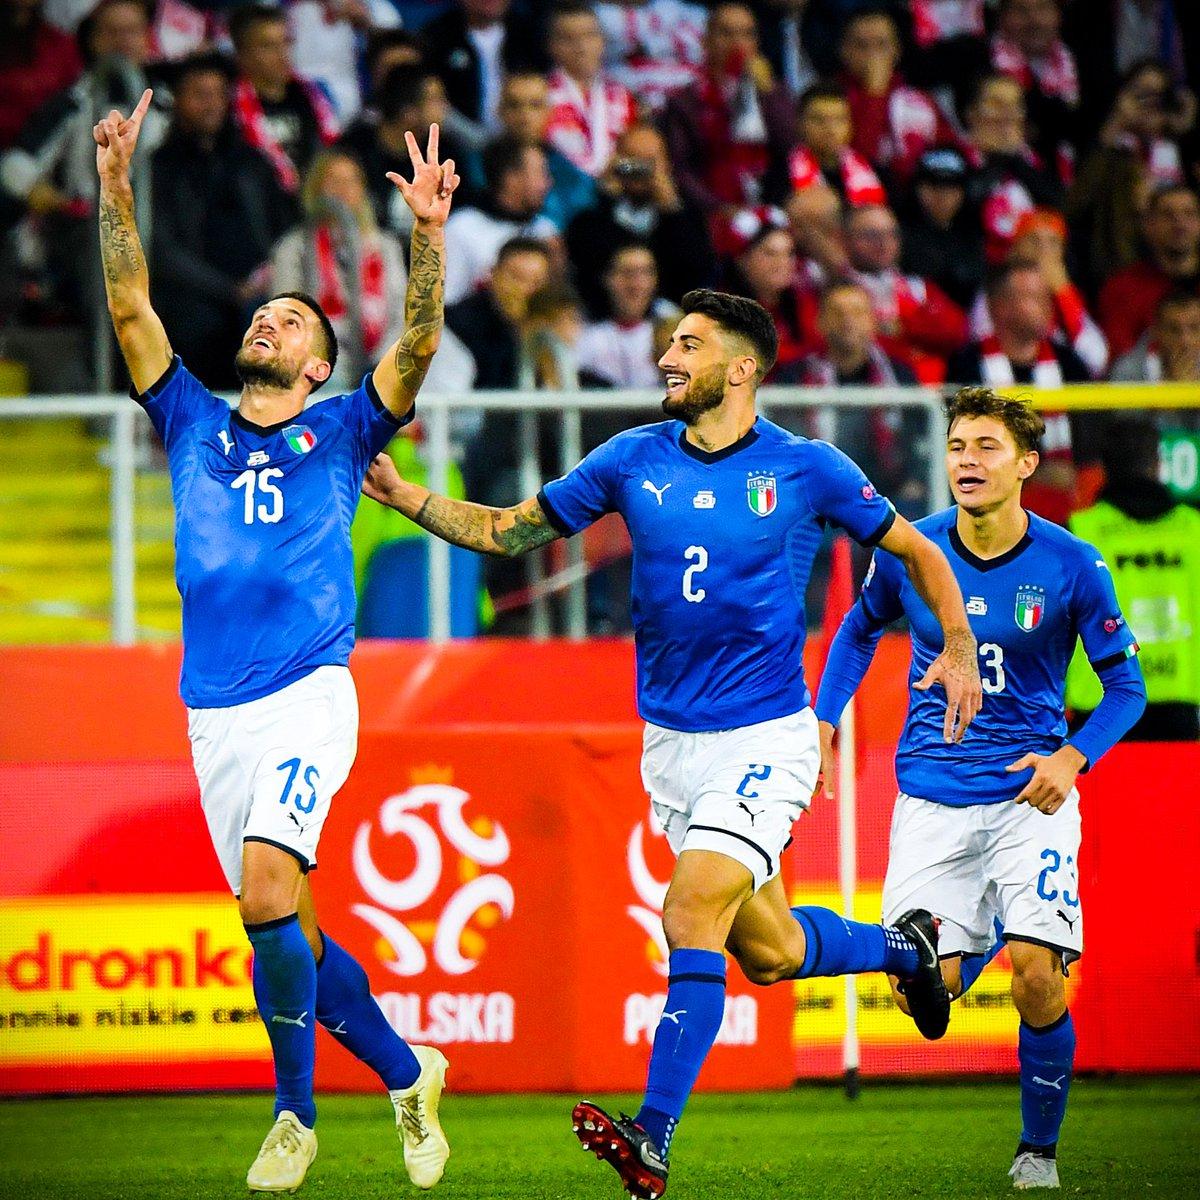 Cristiano Biraghi celebrated scoring Italy's winning goal with a tribute to former Fiorentina captain Davide Astori 1️⃣3️⃣💜